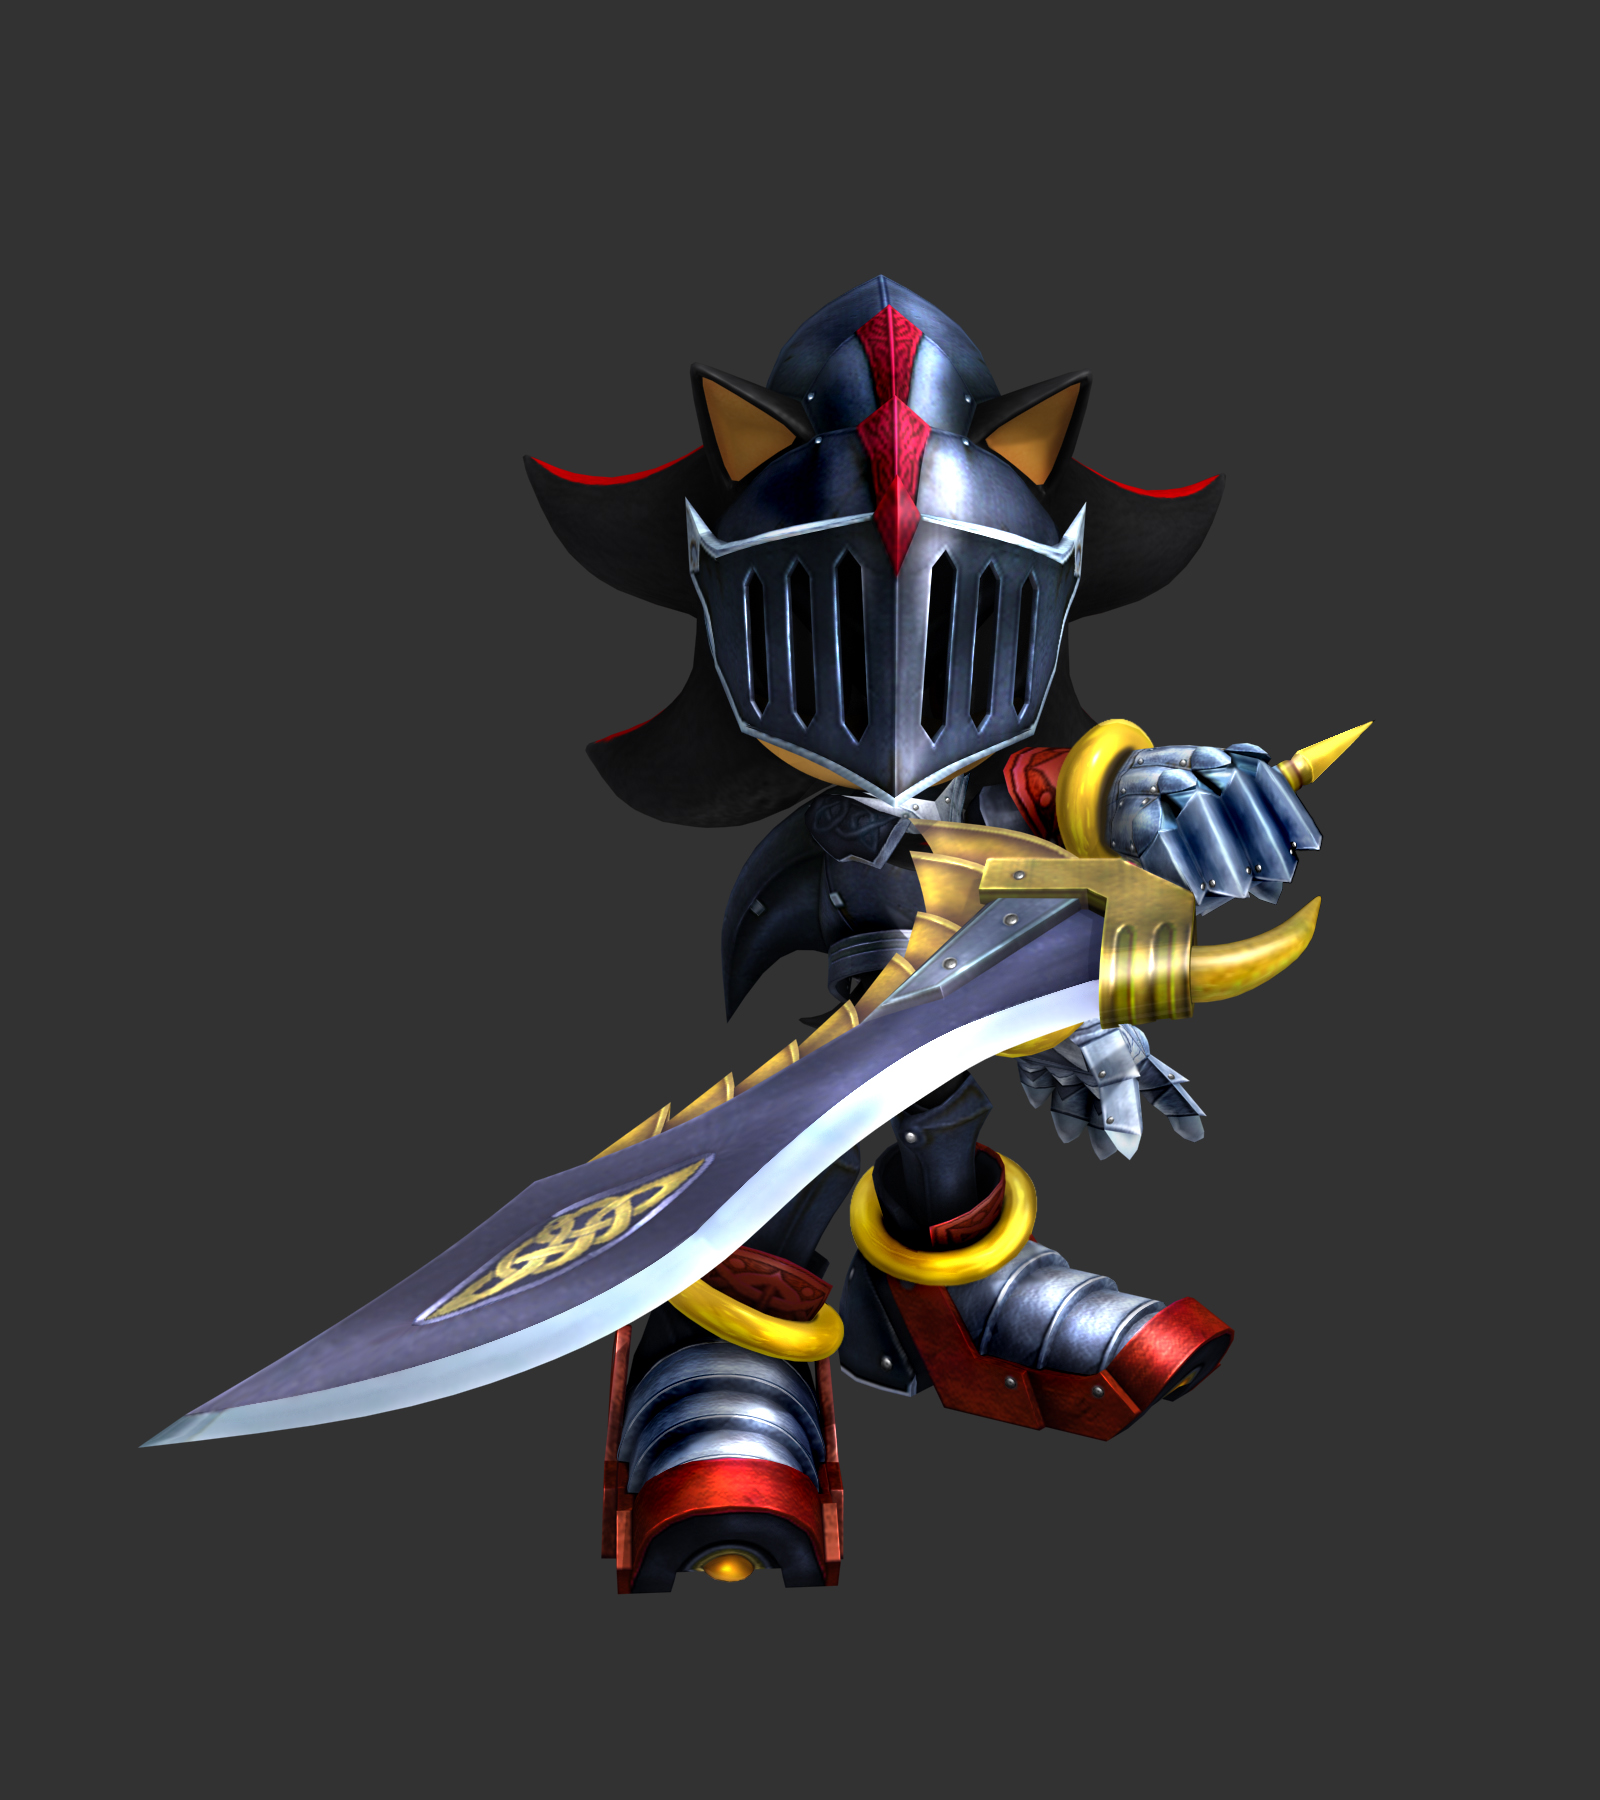 http://www.planete-sonic.com/IMG/jpg/a668_Lancelot_Sword.jpg